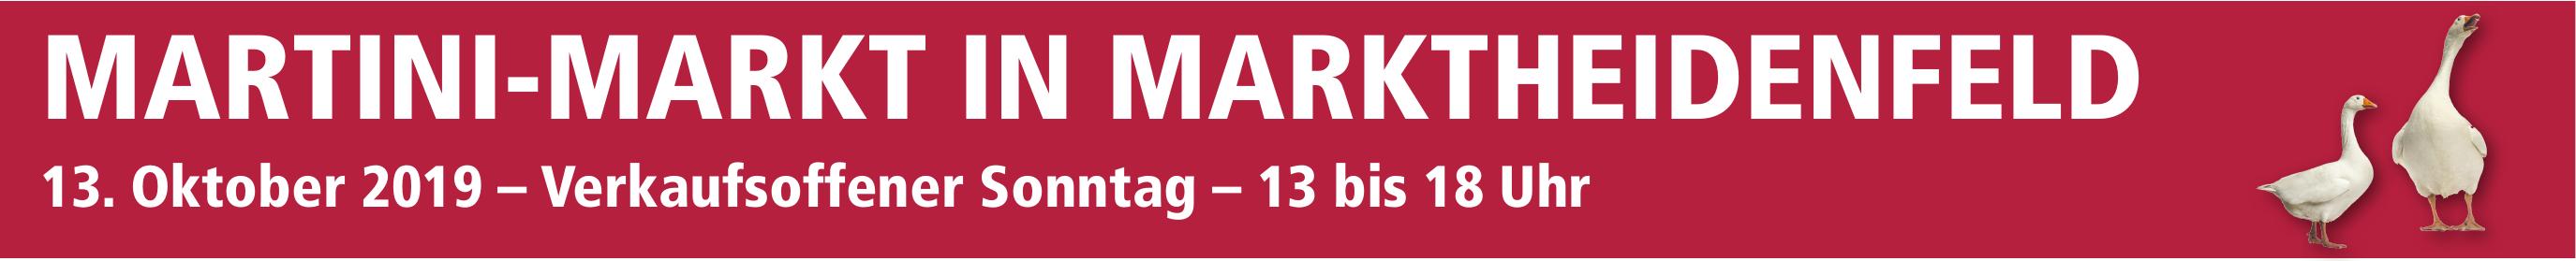 Martini-Markt in Marktheidenfeld Image 1